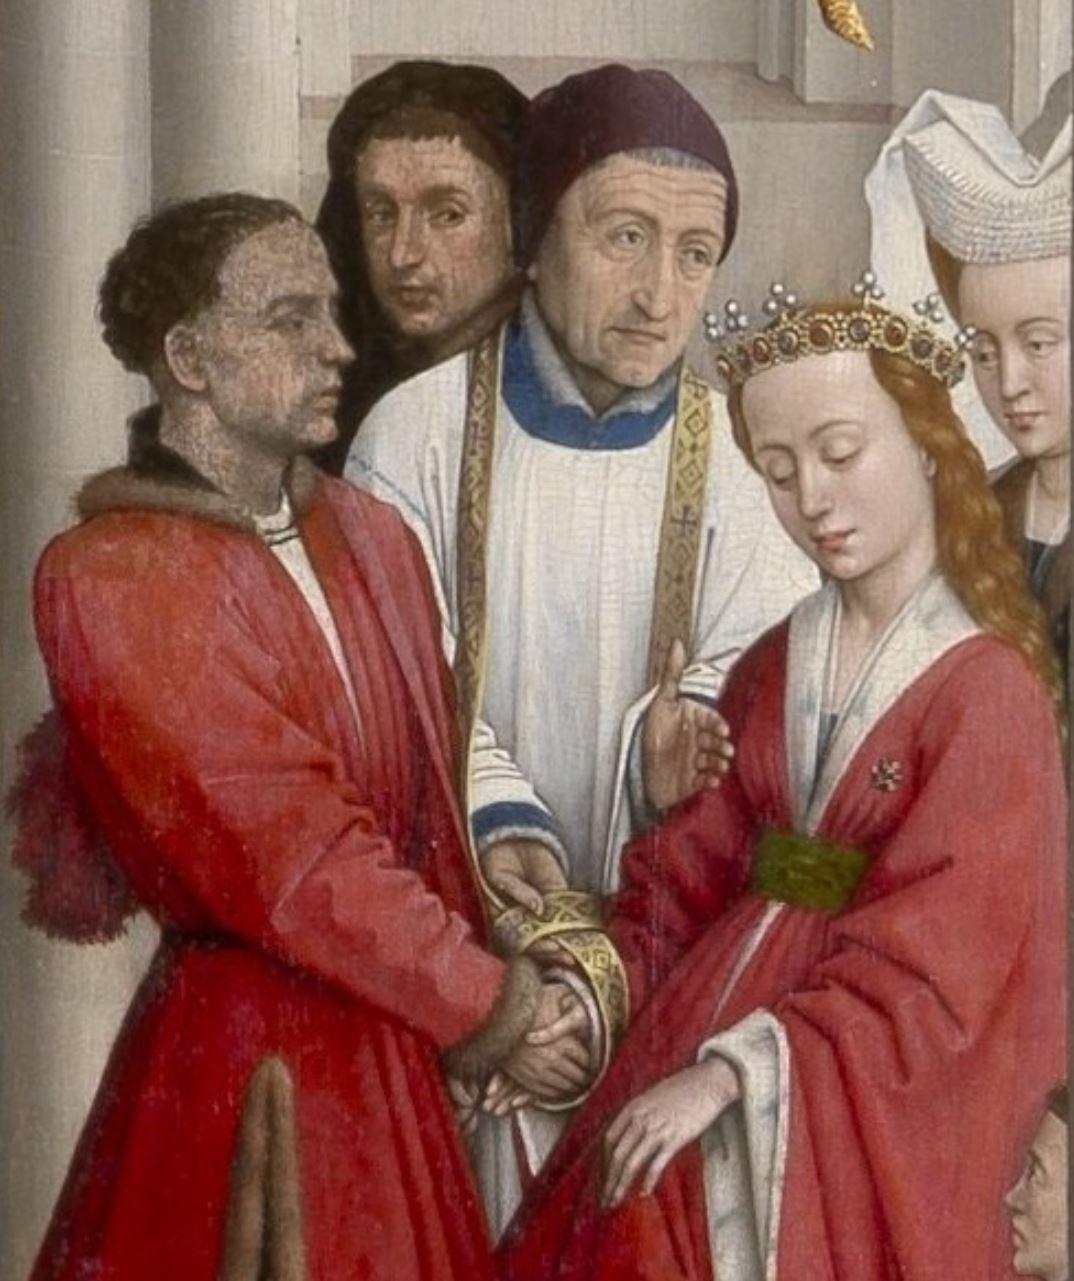 Retable des sept sacrements, mariage, Van der Weyden 1445-50 Musee royal des Beaux Arts Anvers